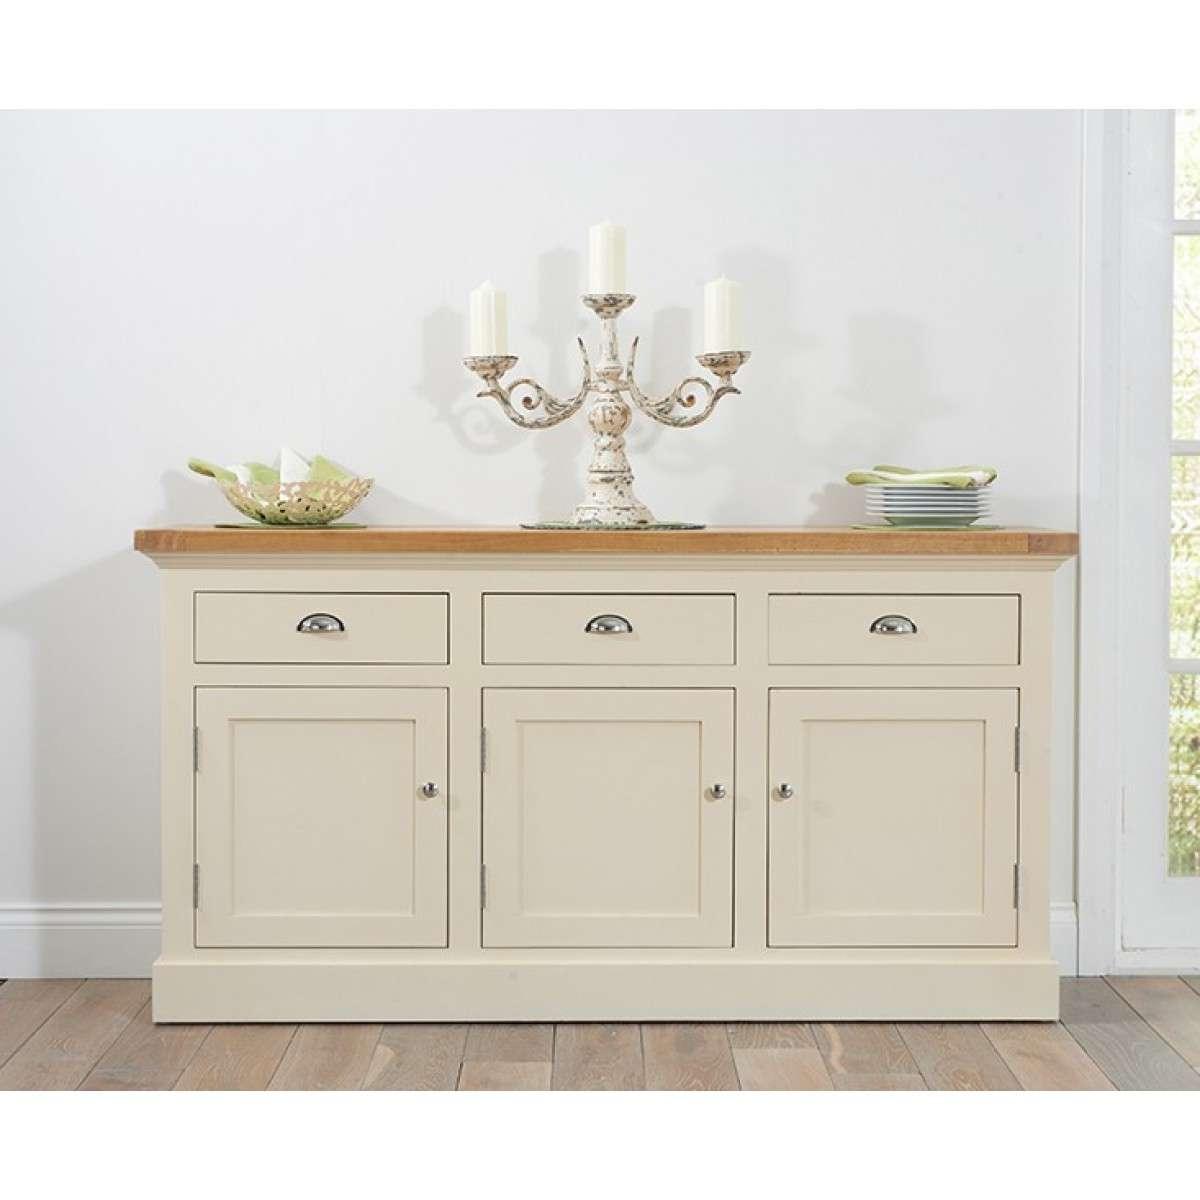 Home Furniture Trading Cavanaugh Large Oak & Cream Sideboard Regarding Cream And Oak Sideboards (View 20 of 20)